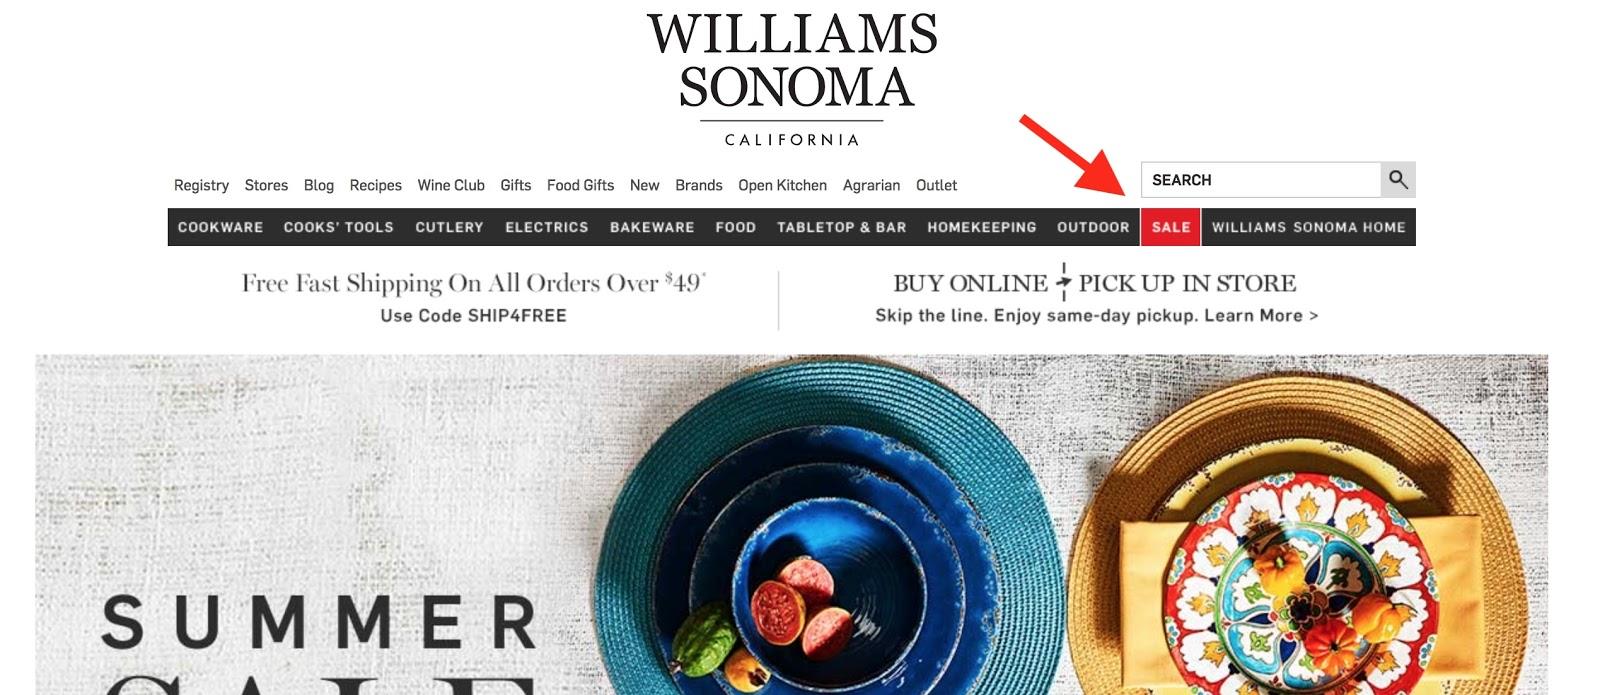 Screenshot showing Williams Sonoma